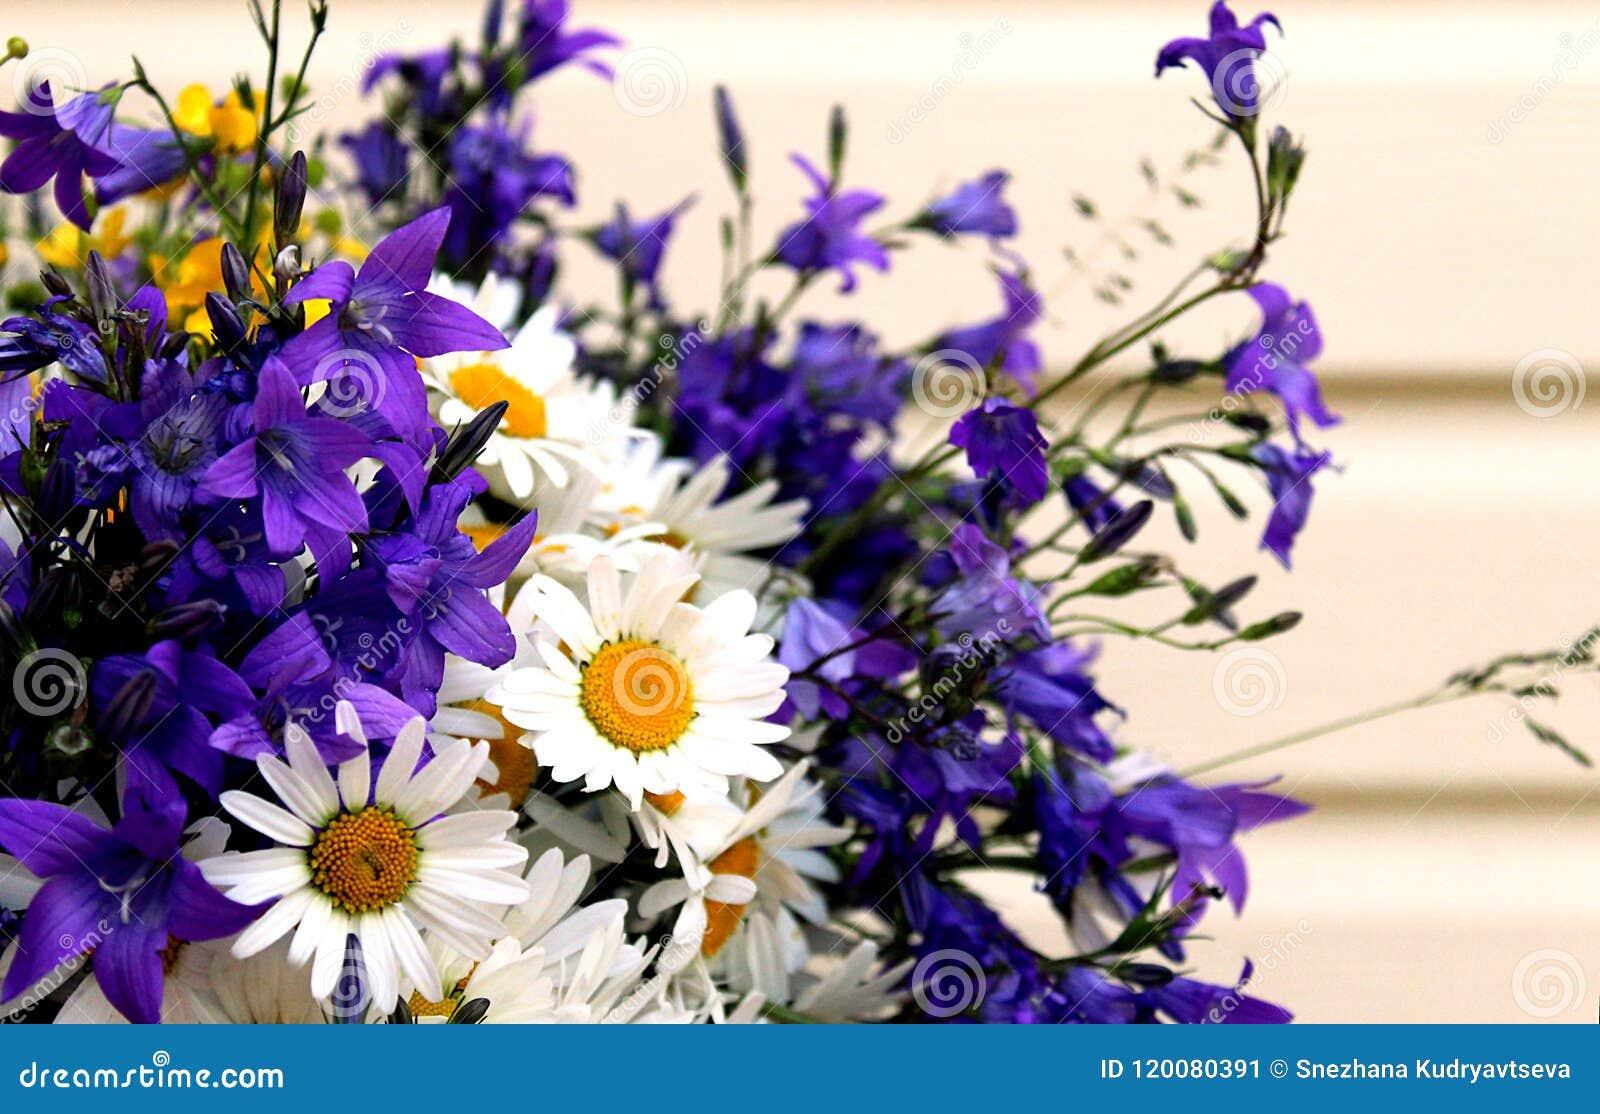 Beautiful Summer Flowers: